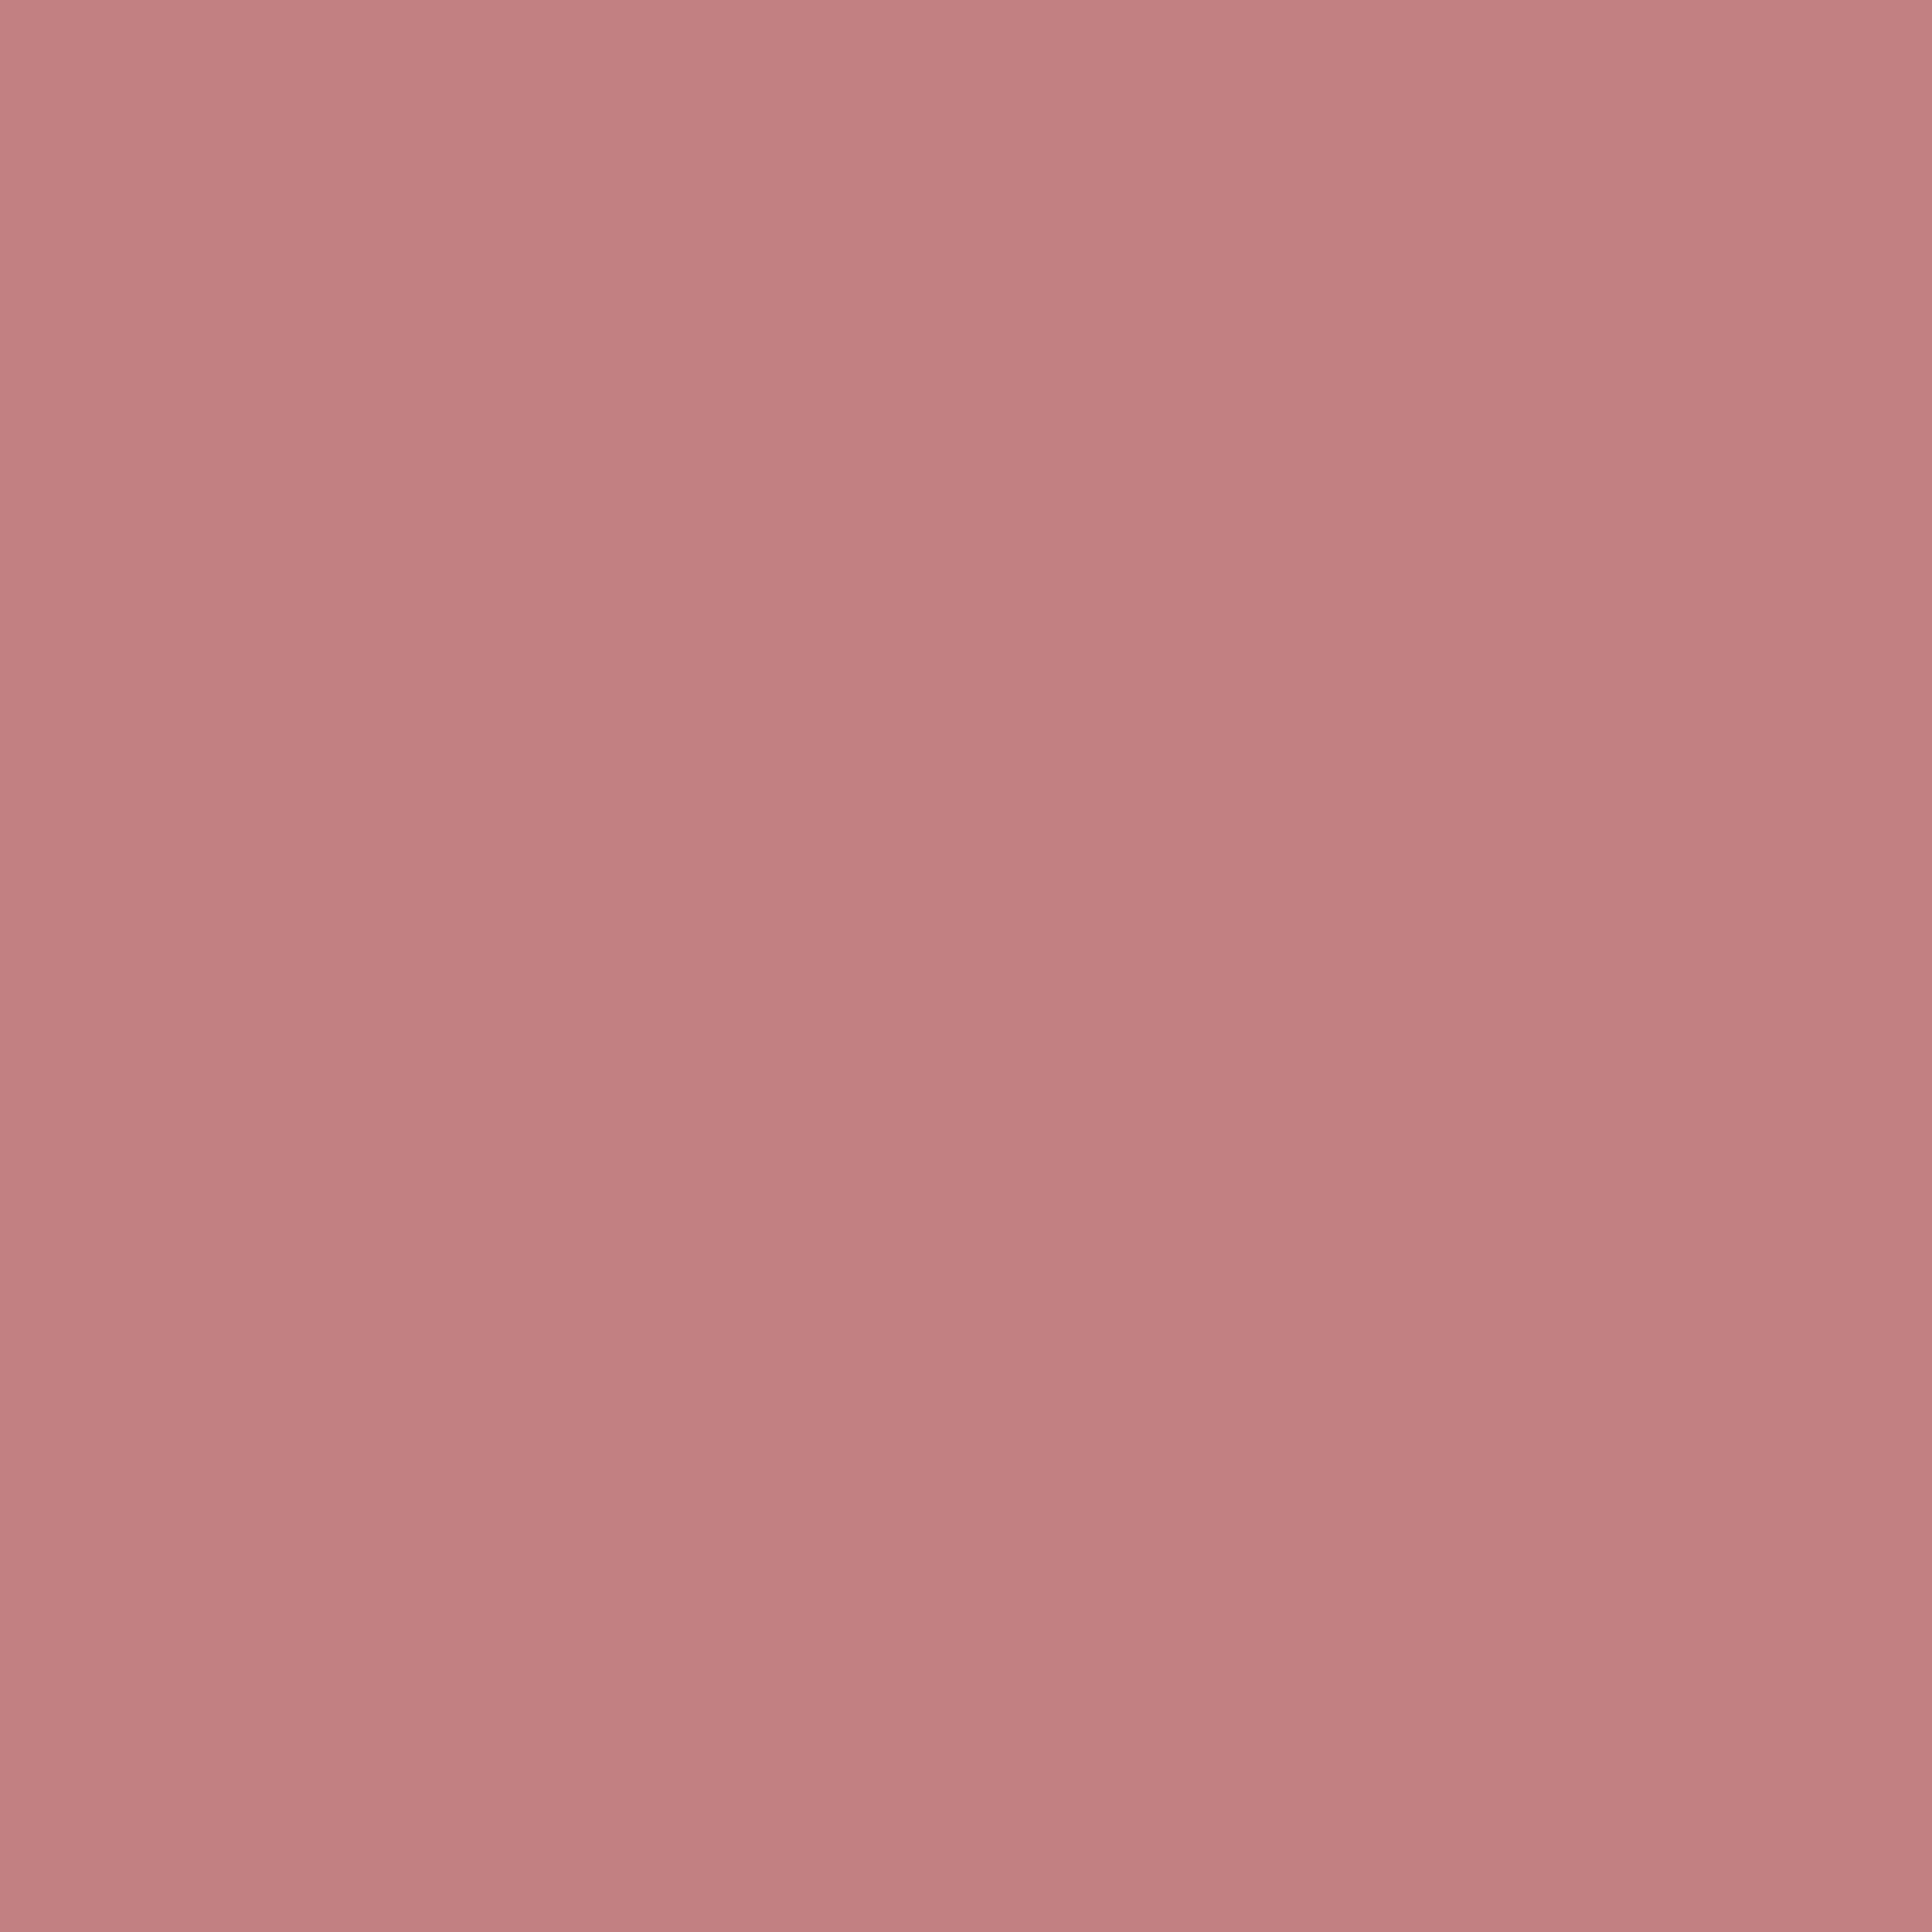 3600x3600 Old Rose Solid Color Background